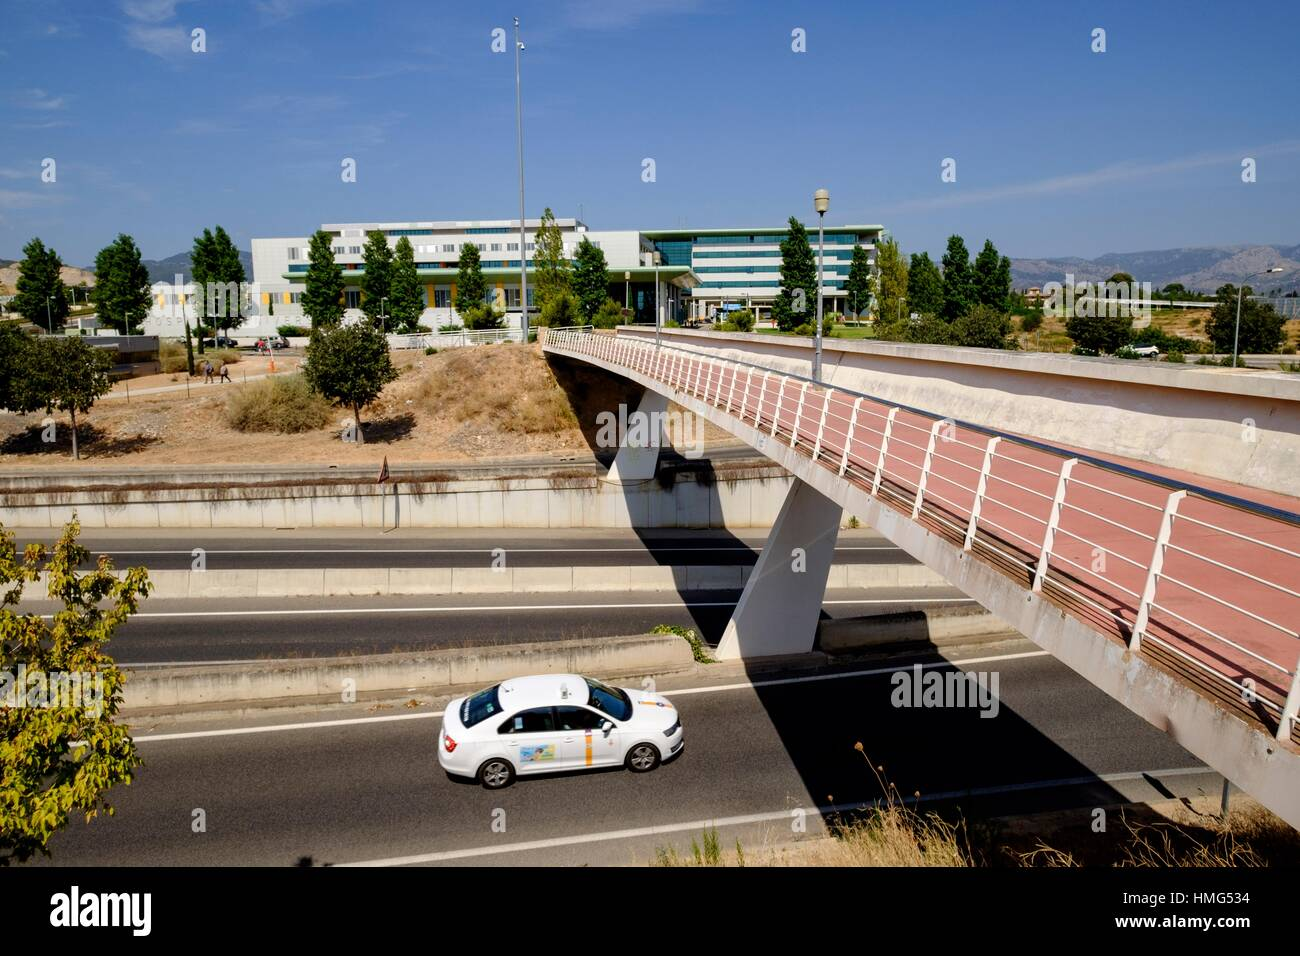 carril para bicicletas, hospital Son Espases, Palma, Majorca, Balearic Islands, Spain - Stock Image